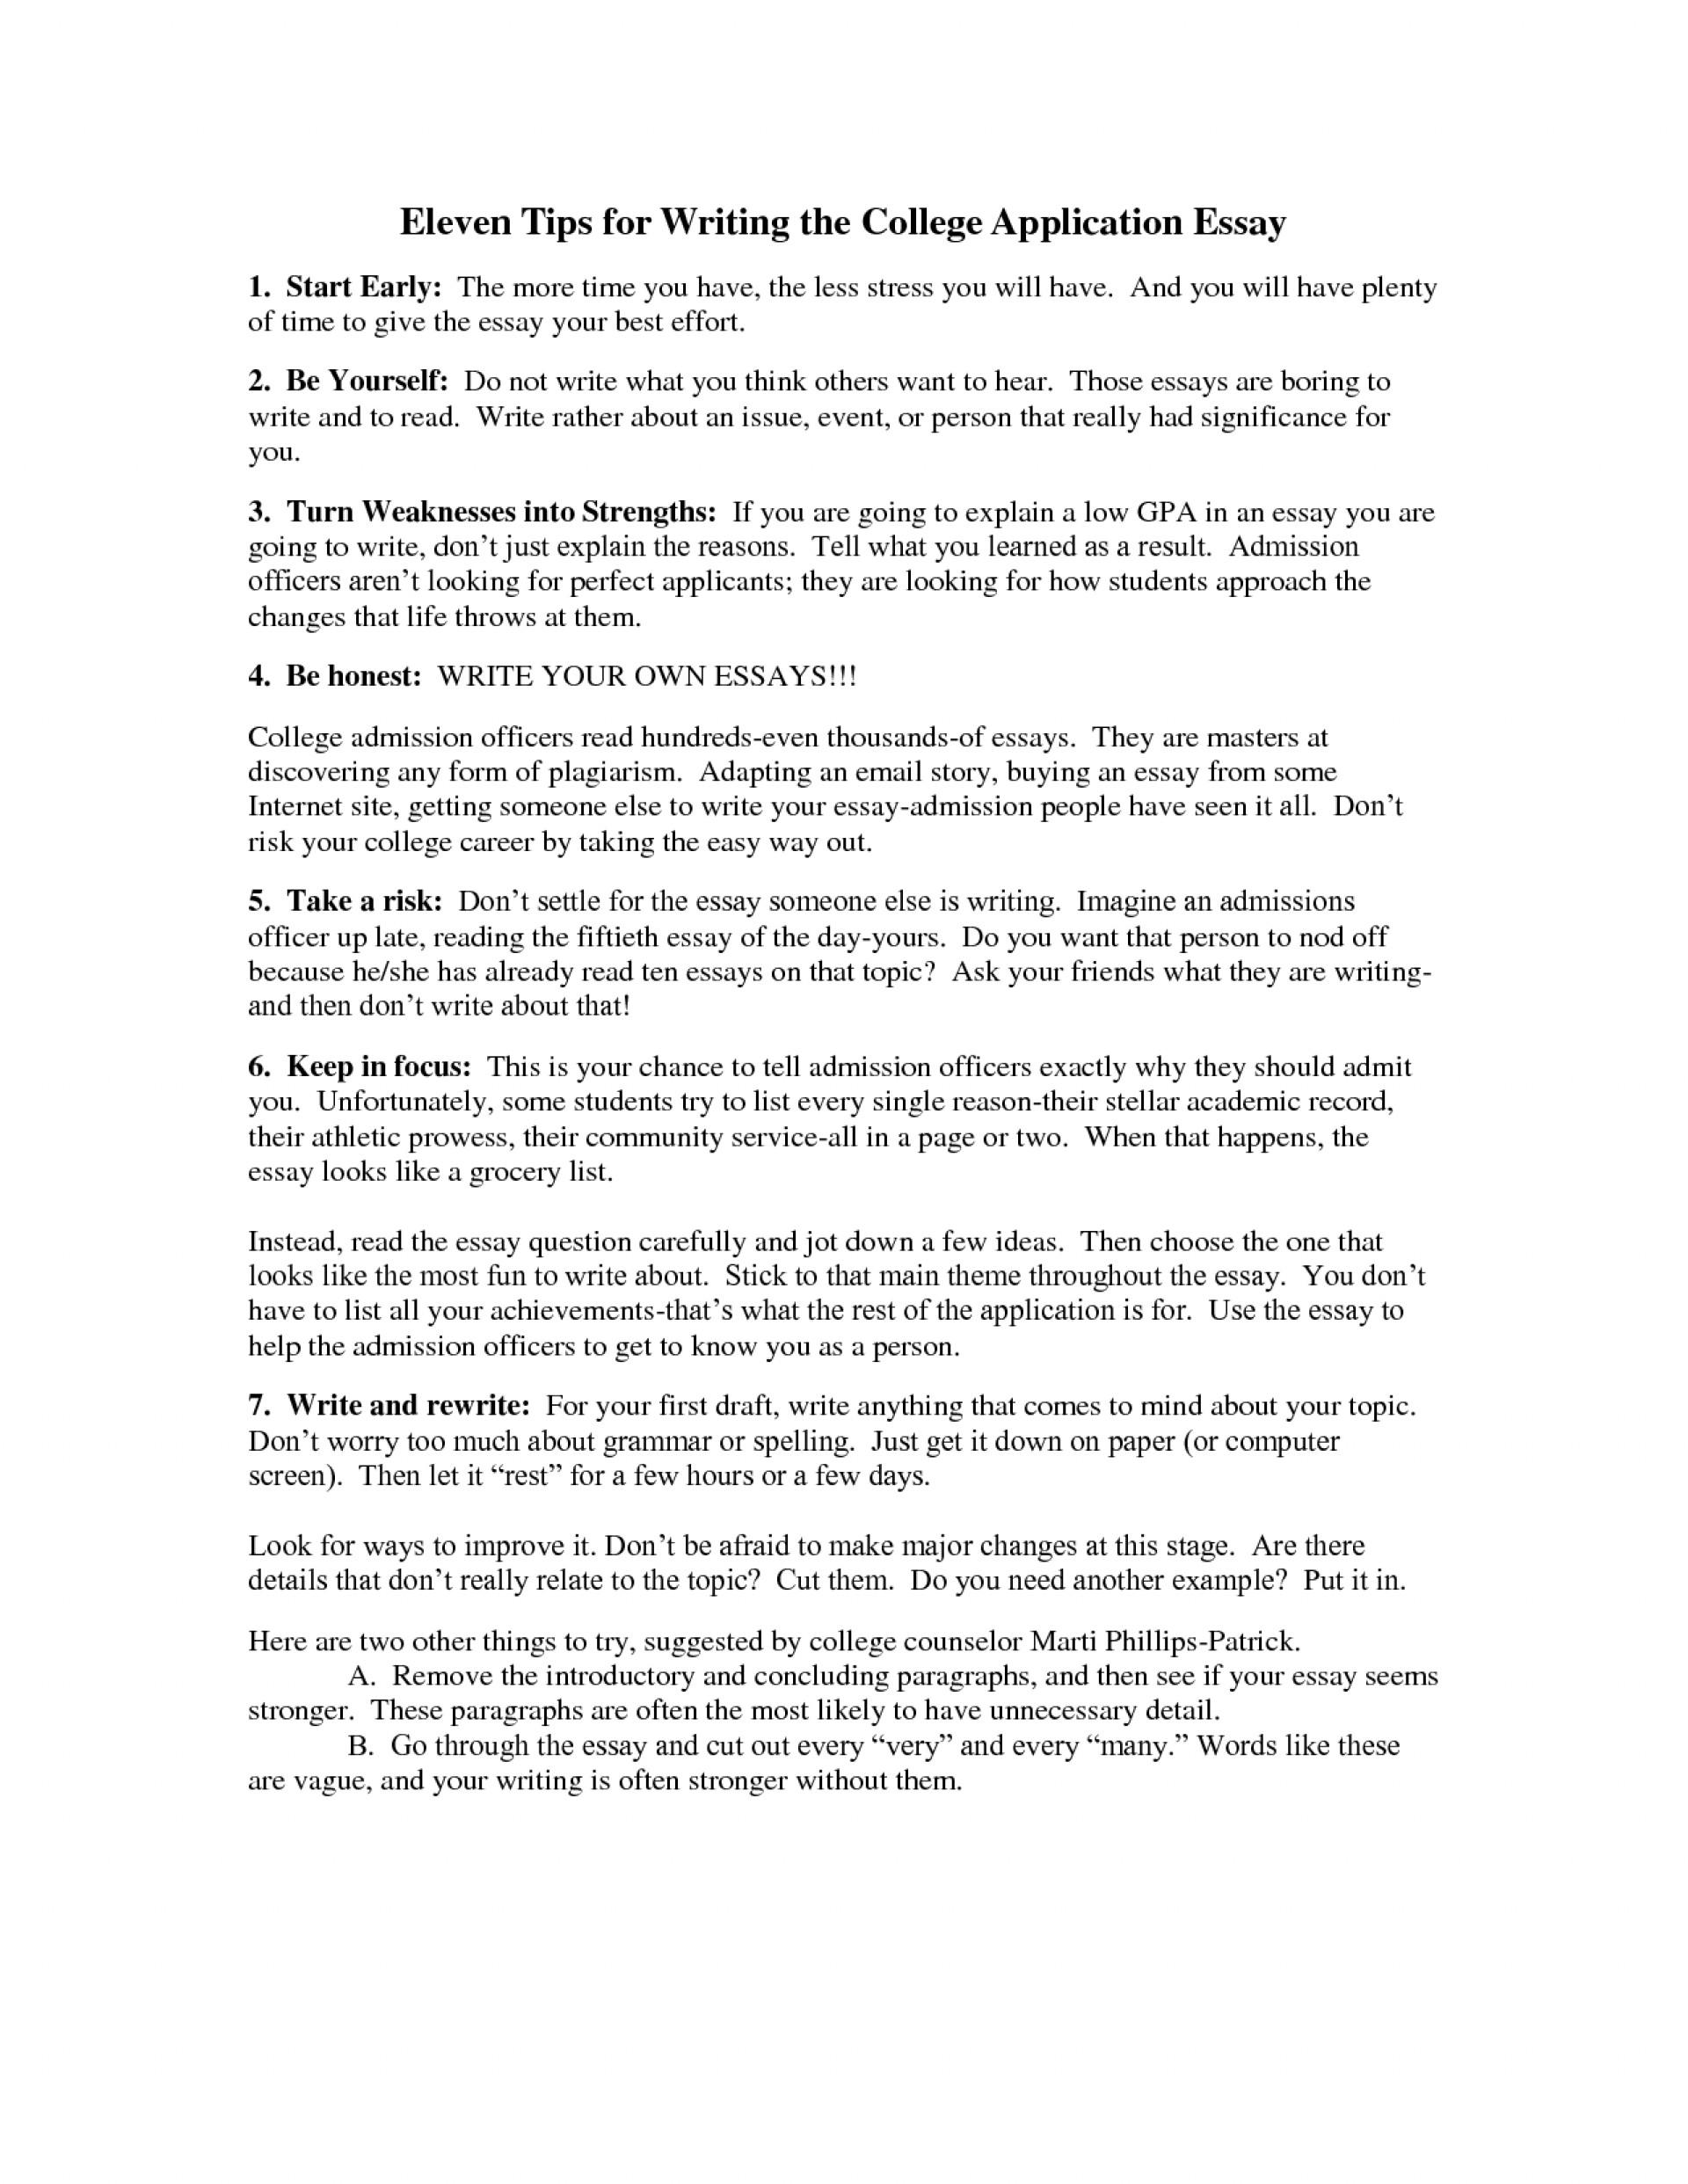 Studymode essay